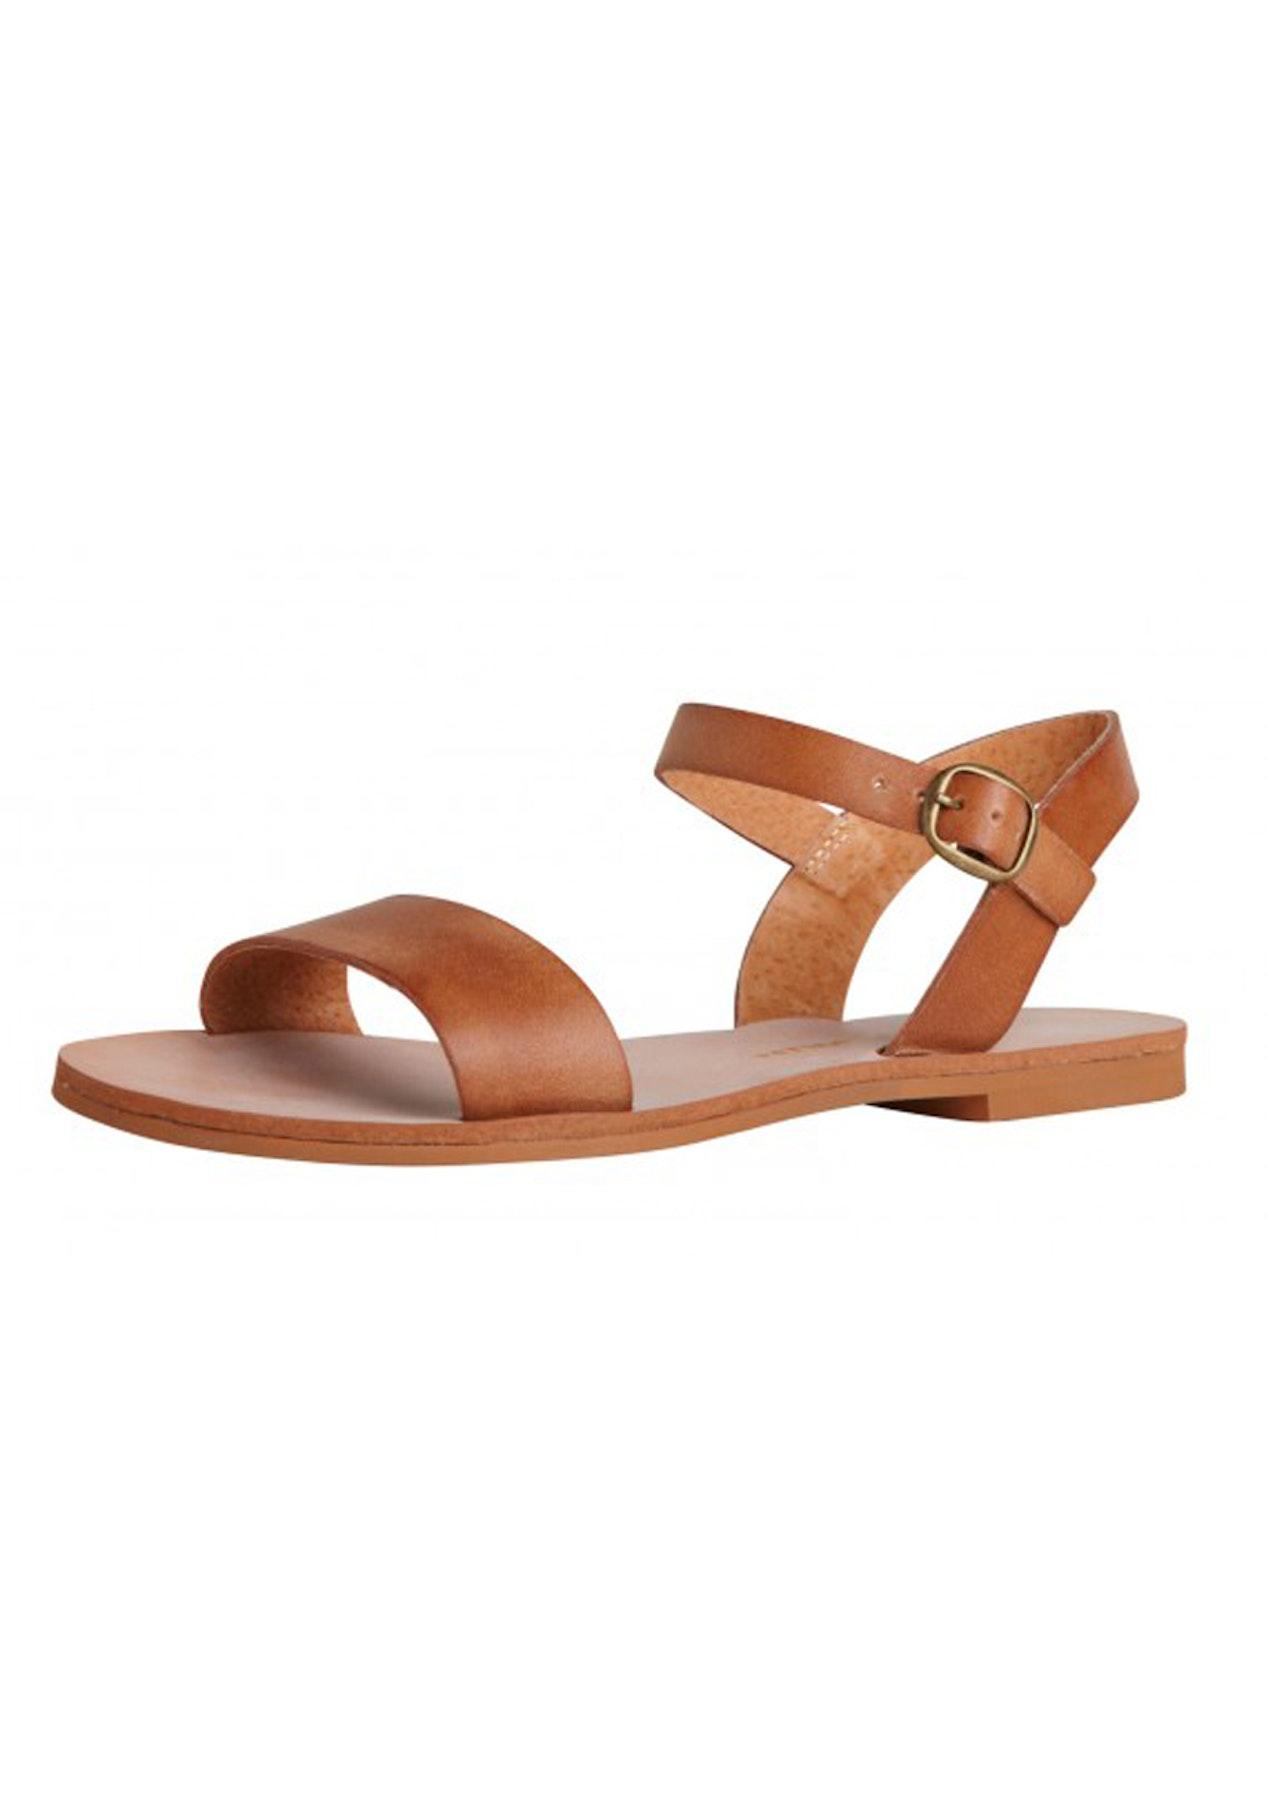 49bfa9d1dc10 Windsor Smith - Bondi - Tan Leather - Monday Shoe Fire Sale - Onceit